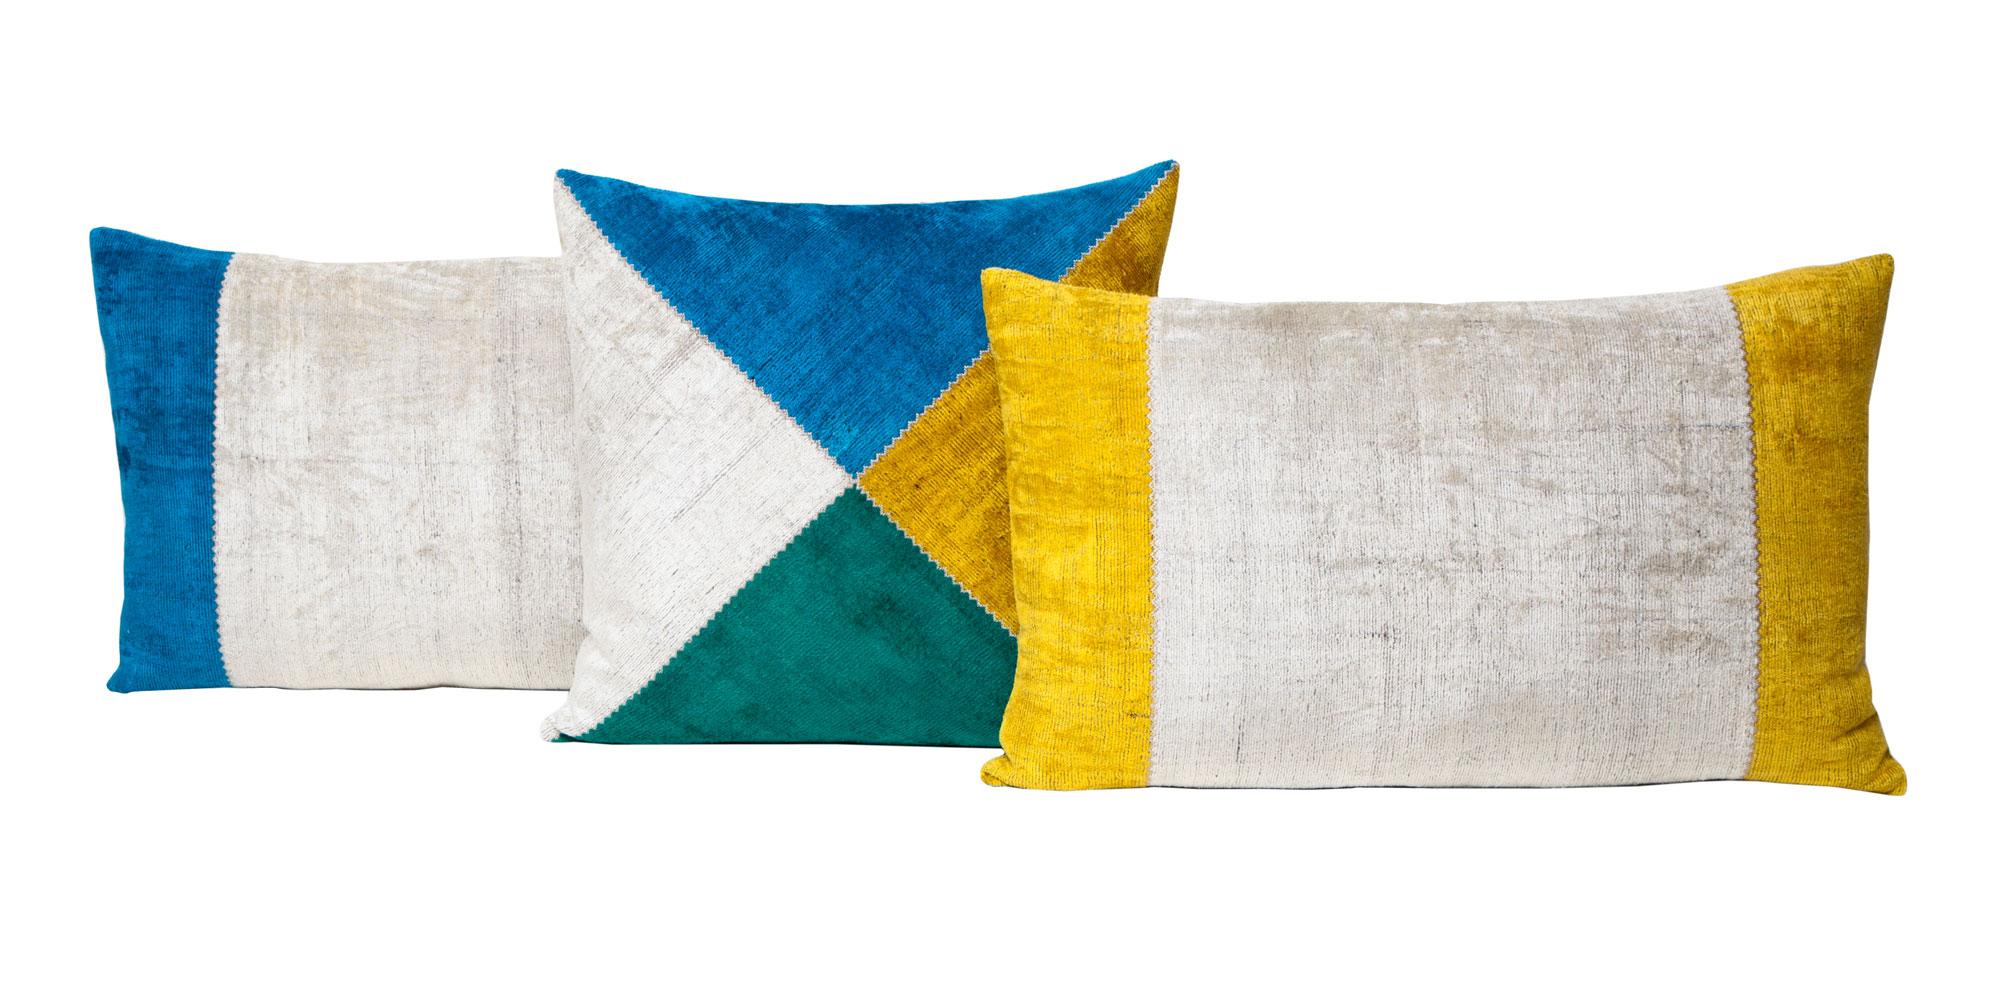 Ozbeck Cushions